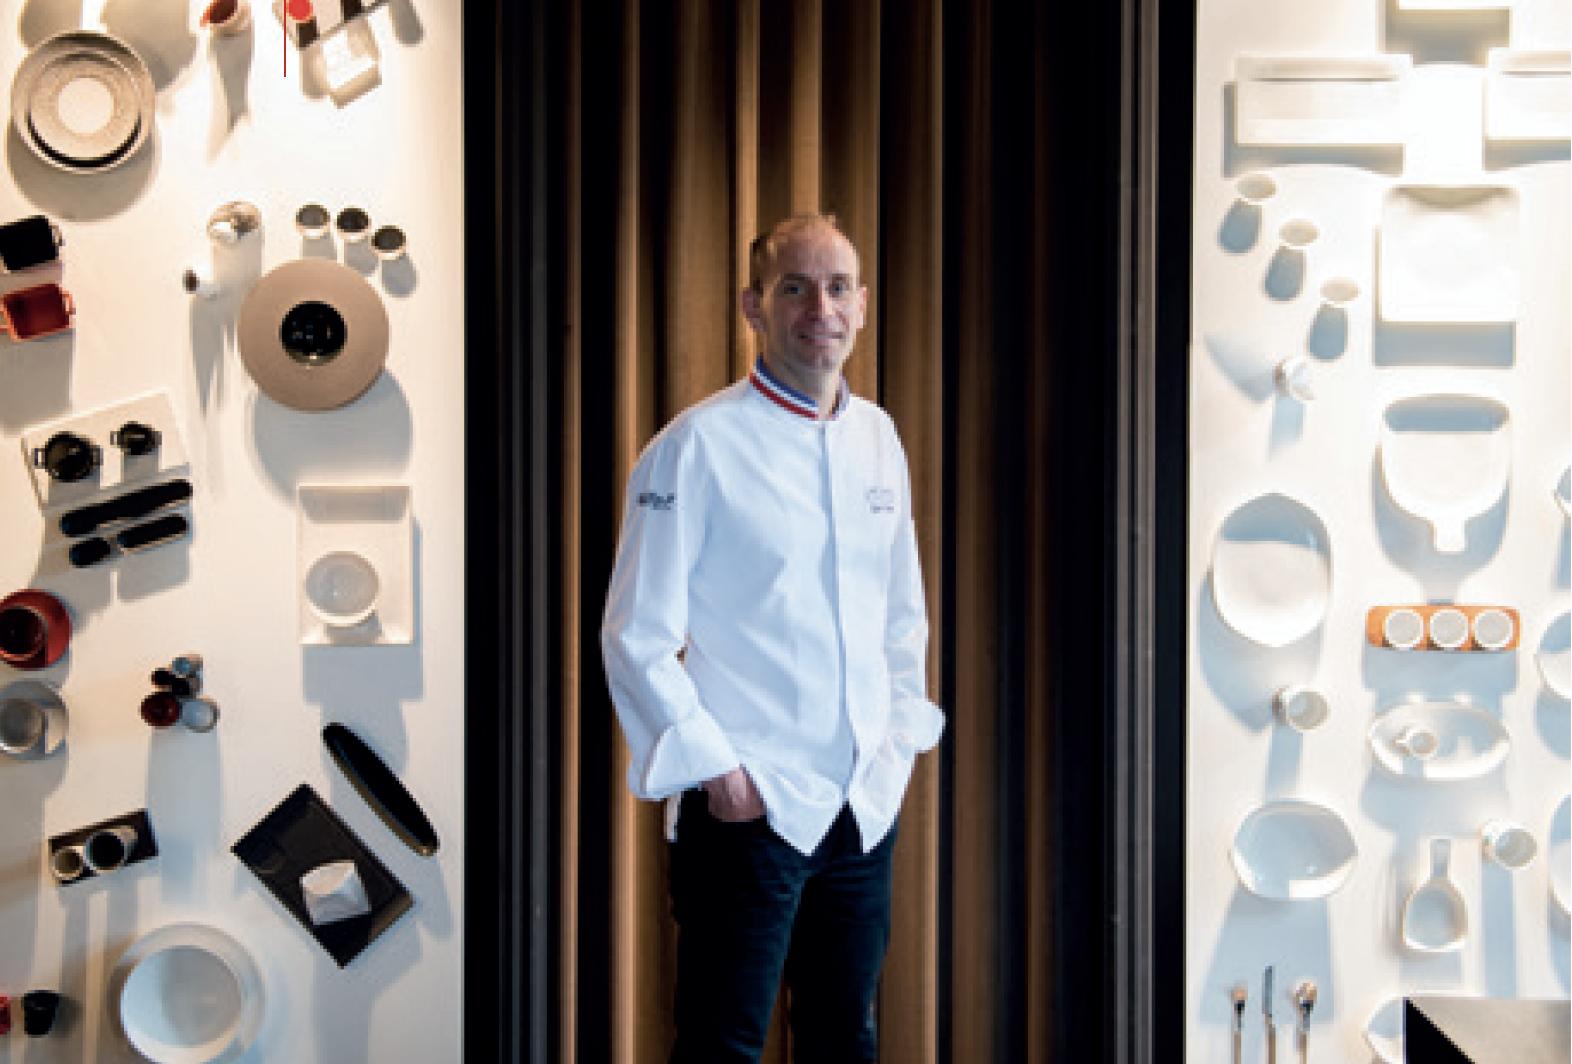 Restaurant Saisons Restaurant d'application - Davy Tissot  et Alain Lecossec